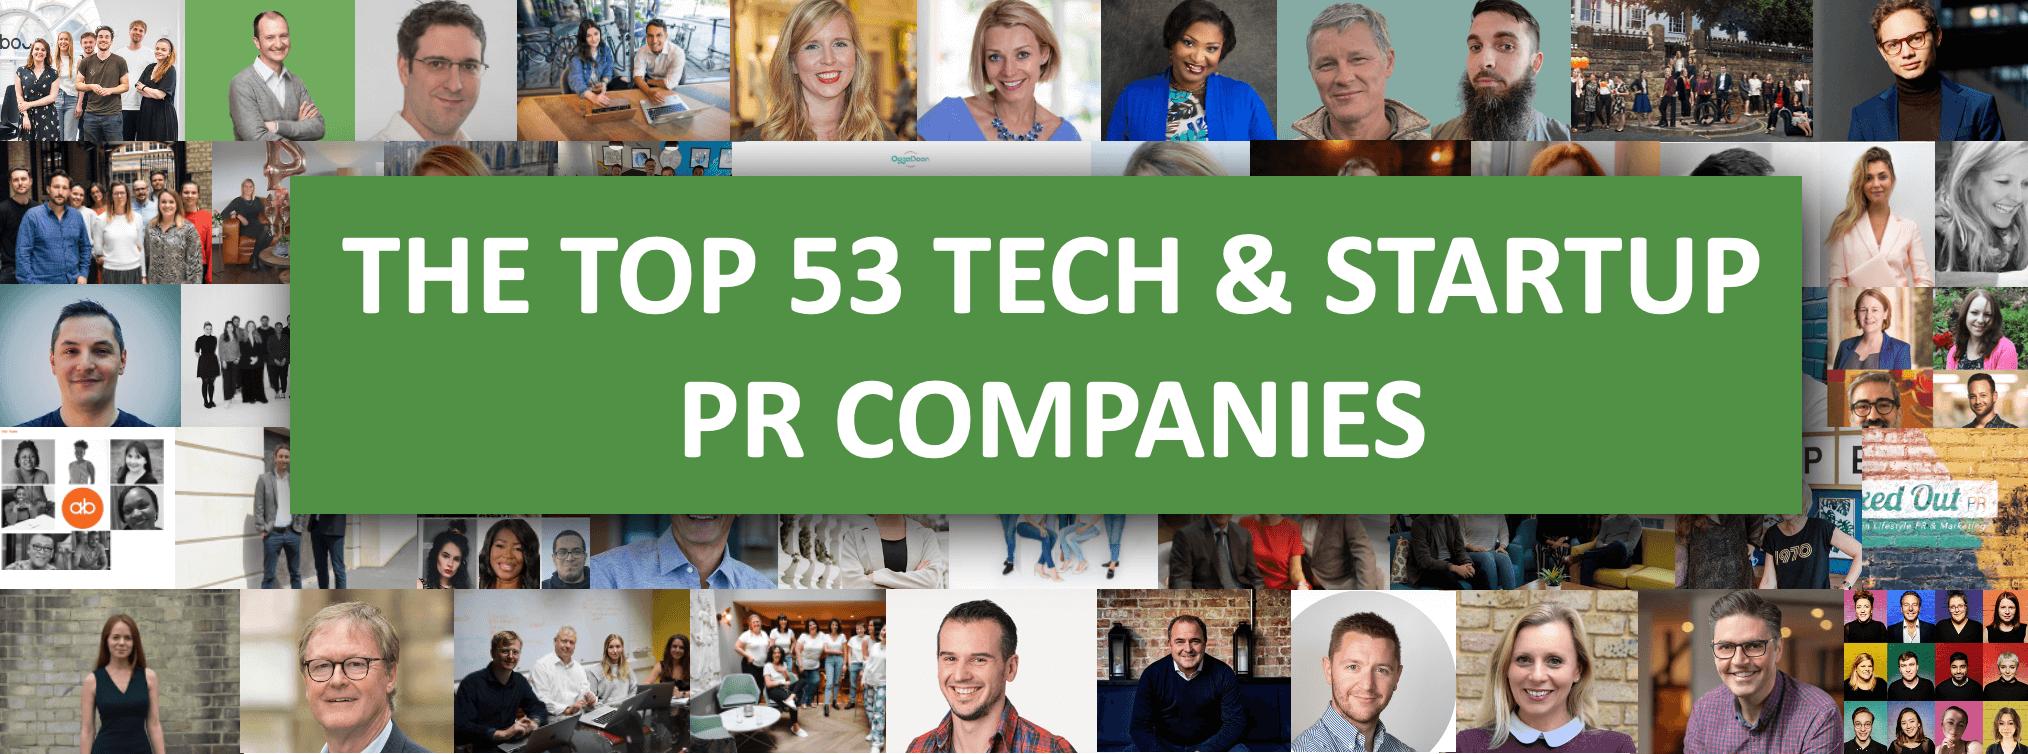 The-Top-53-Tech-Startup-PR-Companies-Banner